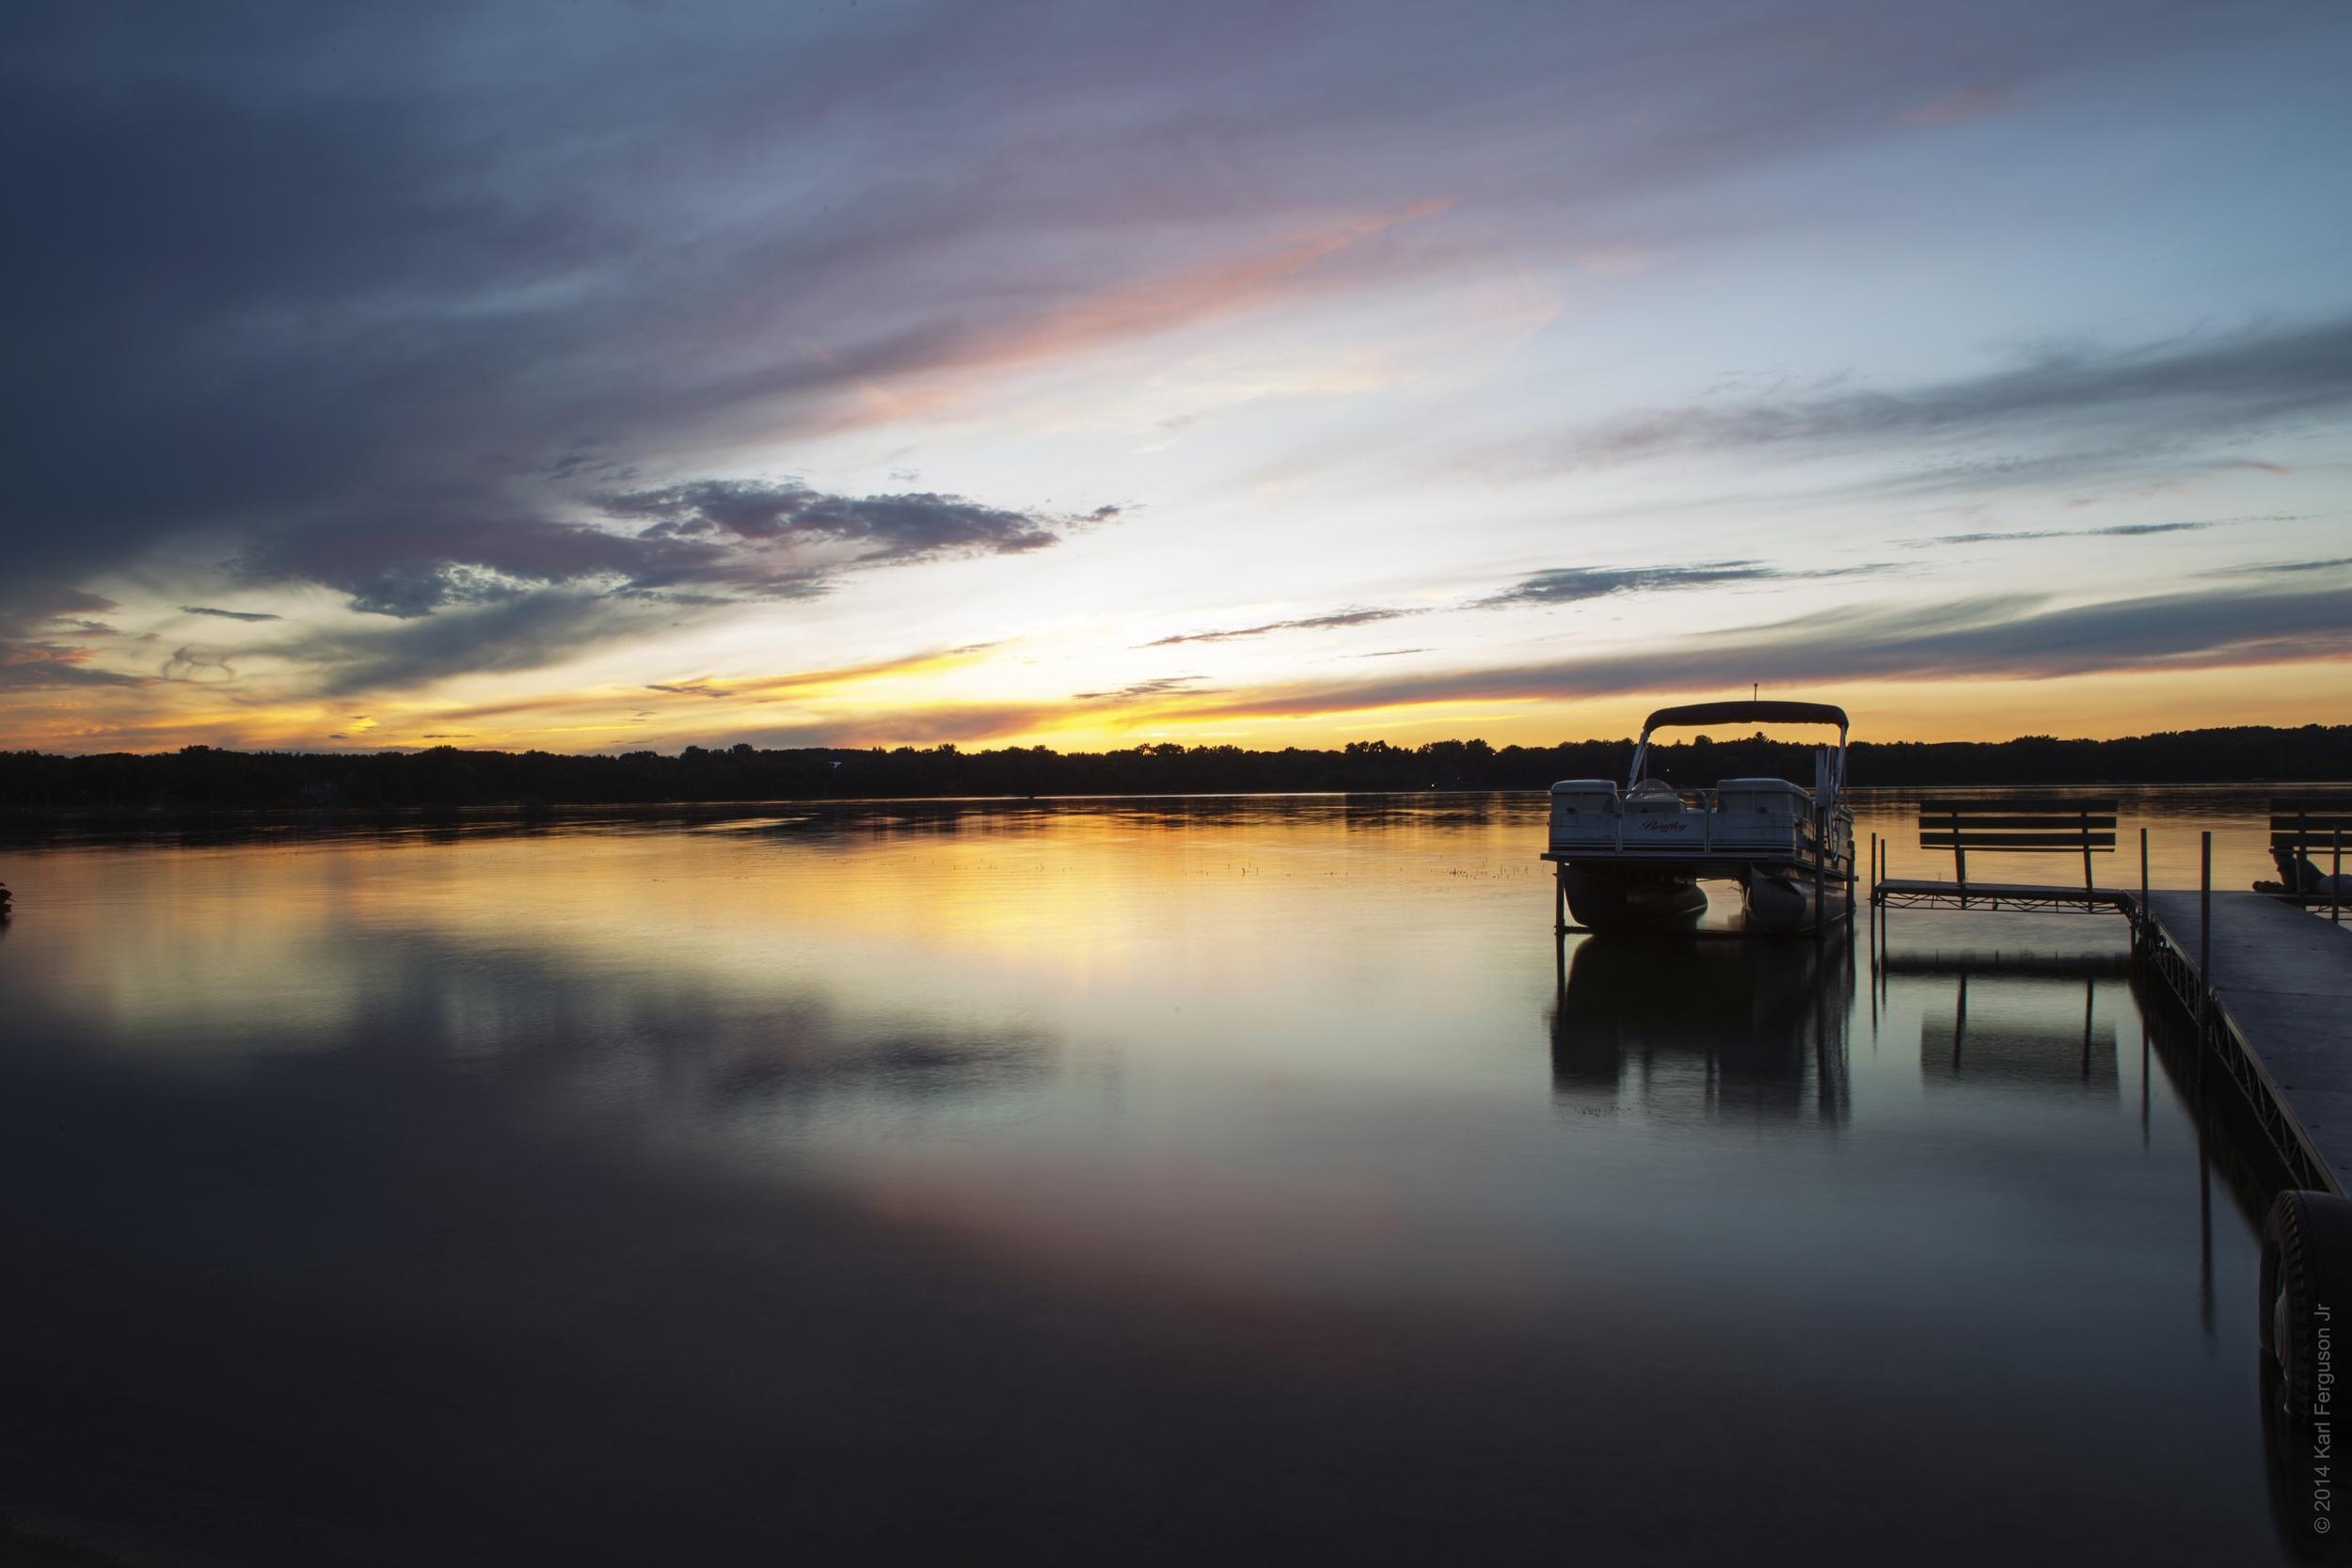 Lake_Sunset_9749_mini.jpg